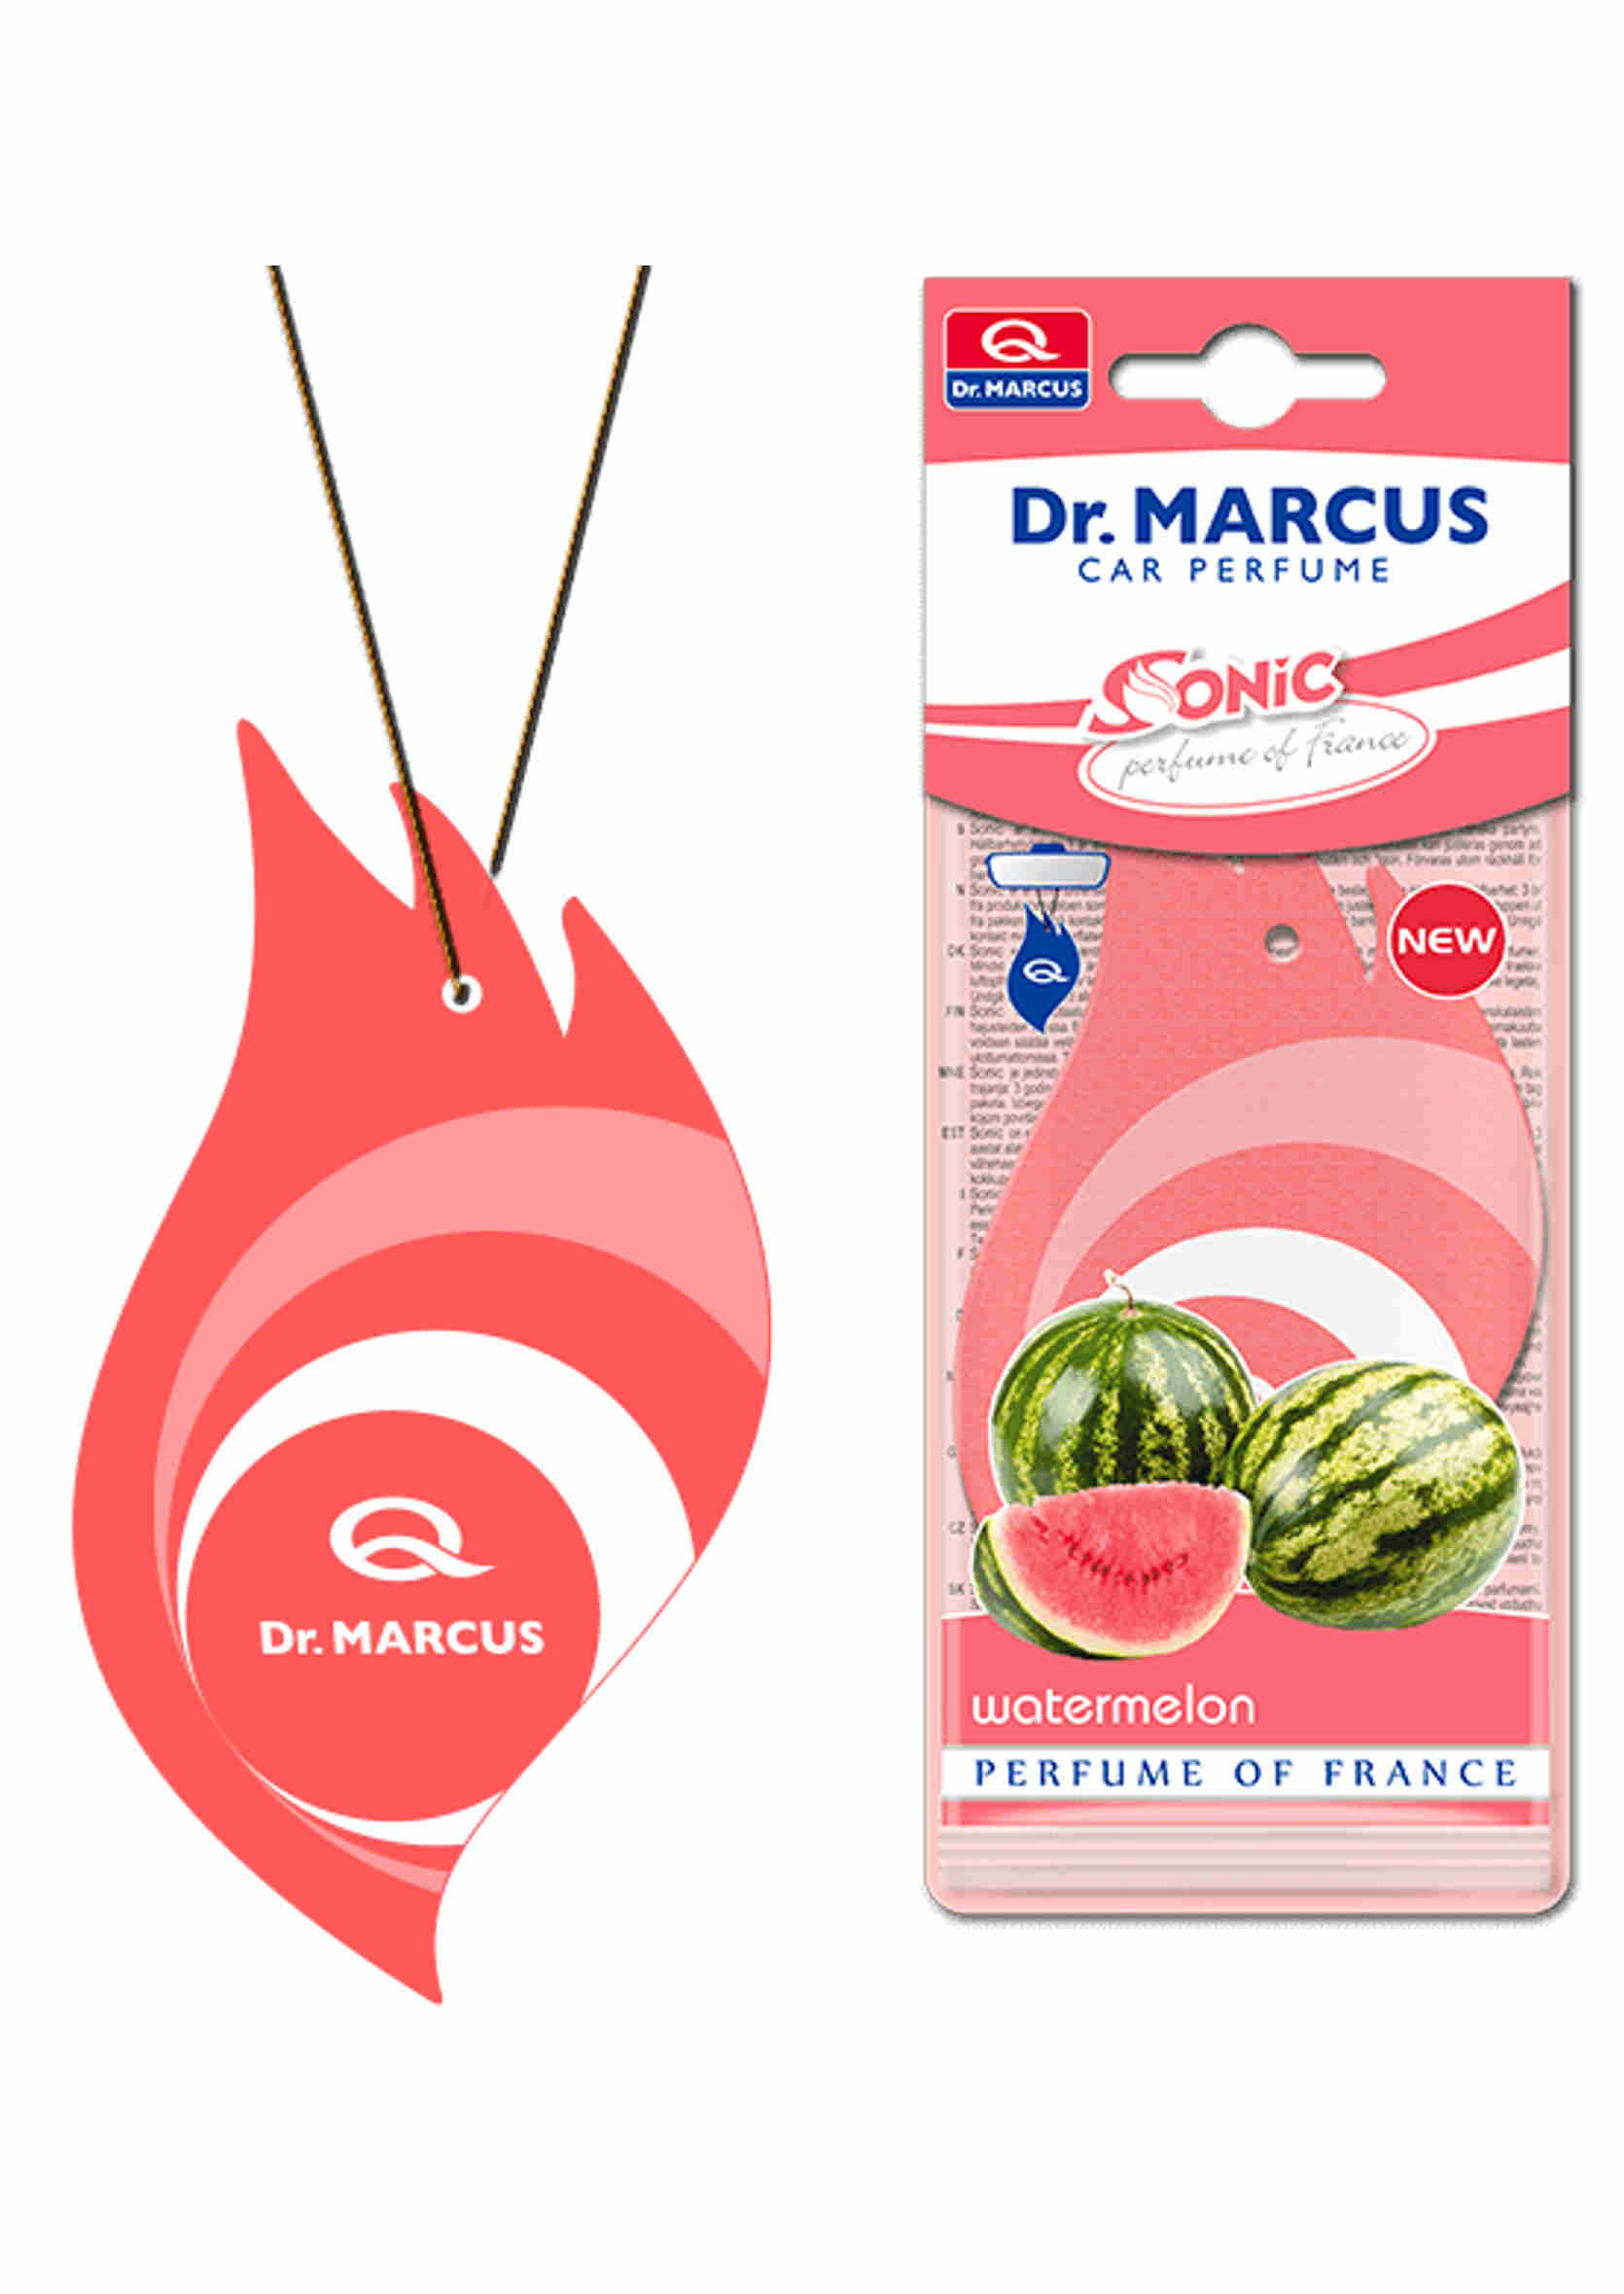 Dr. Marcus Sonic Watermelon Listek Zapachowy Choinka Arbuz